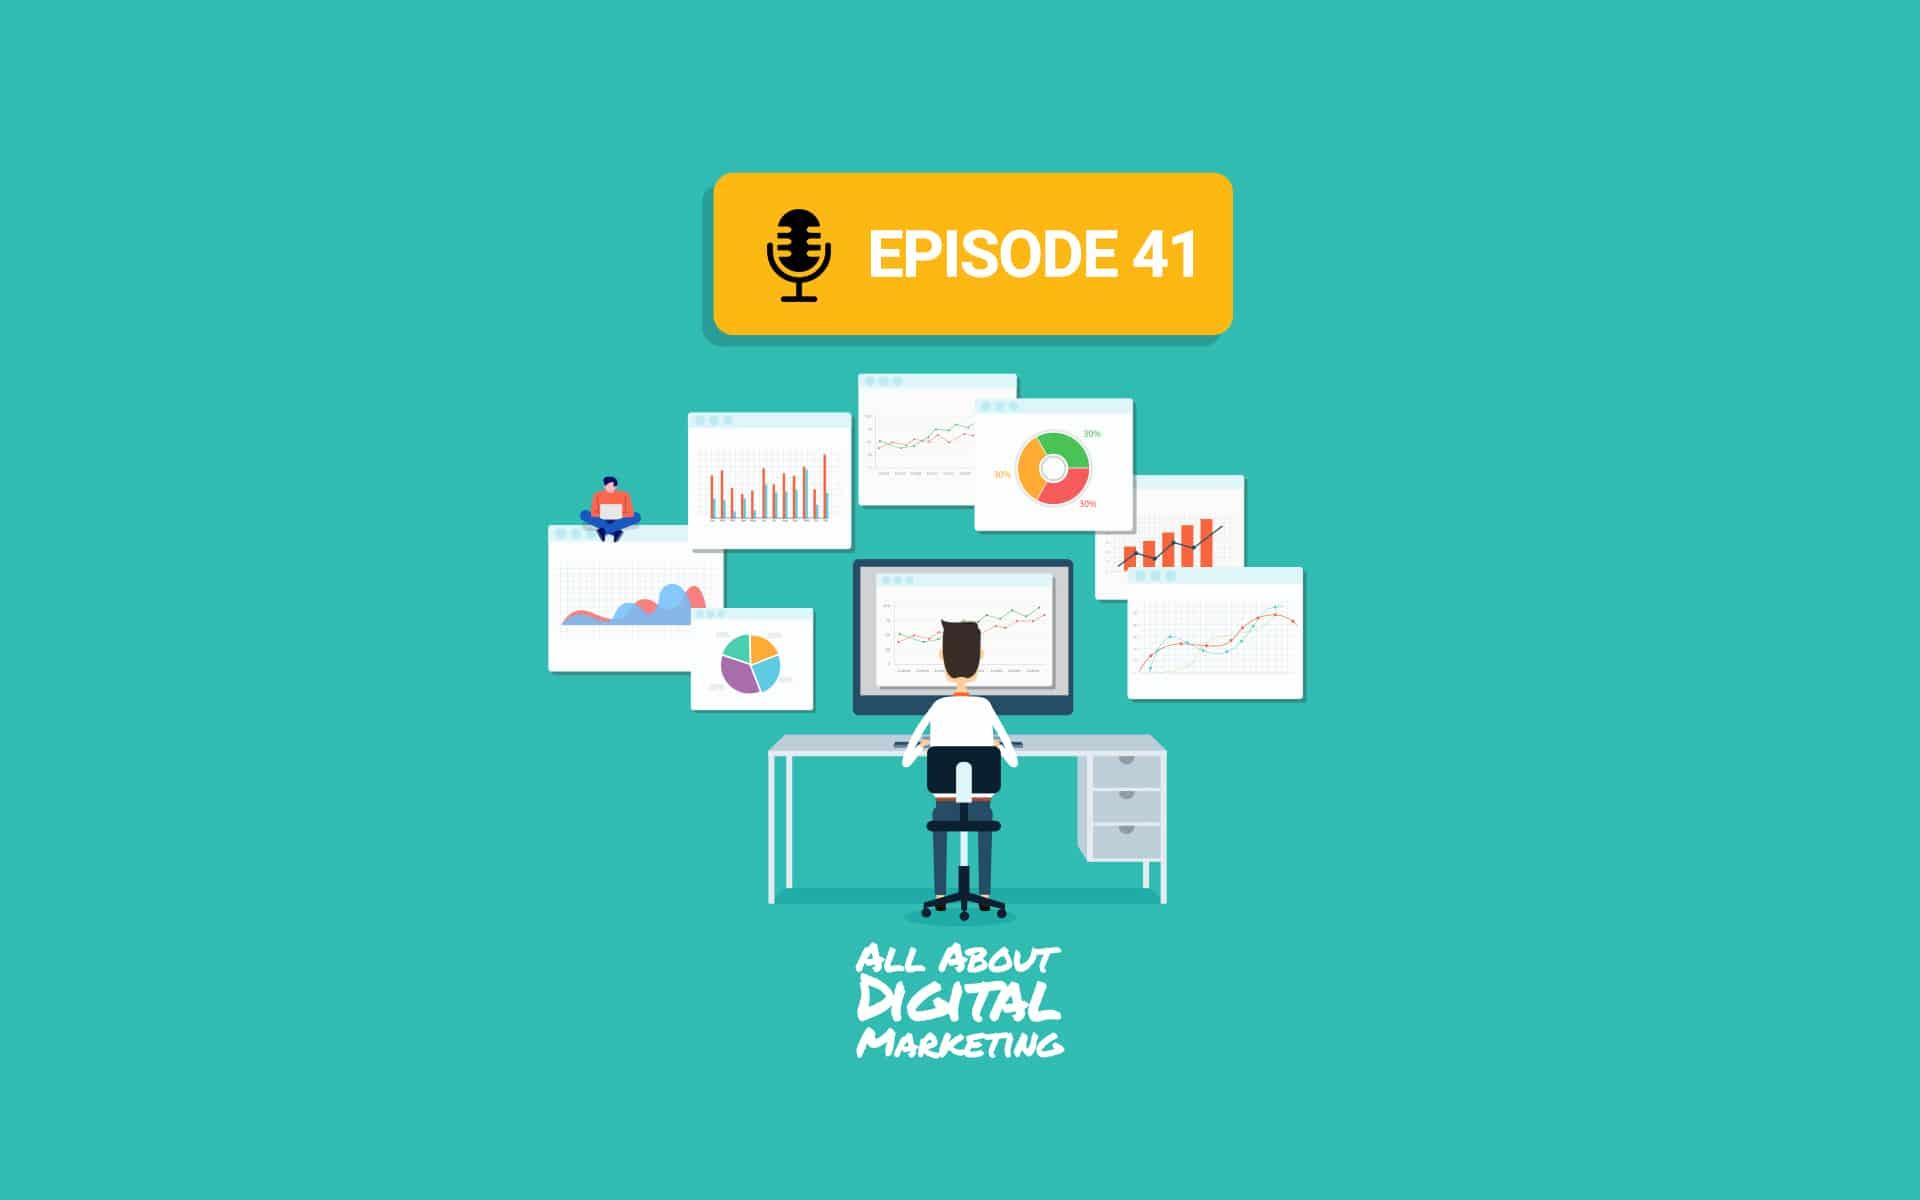 Ep.41 – Analytics, Predictive Marketing and More with John Wall